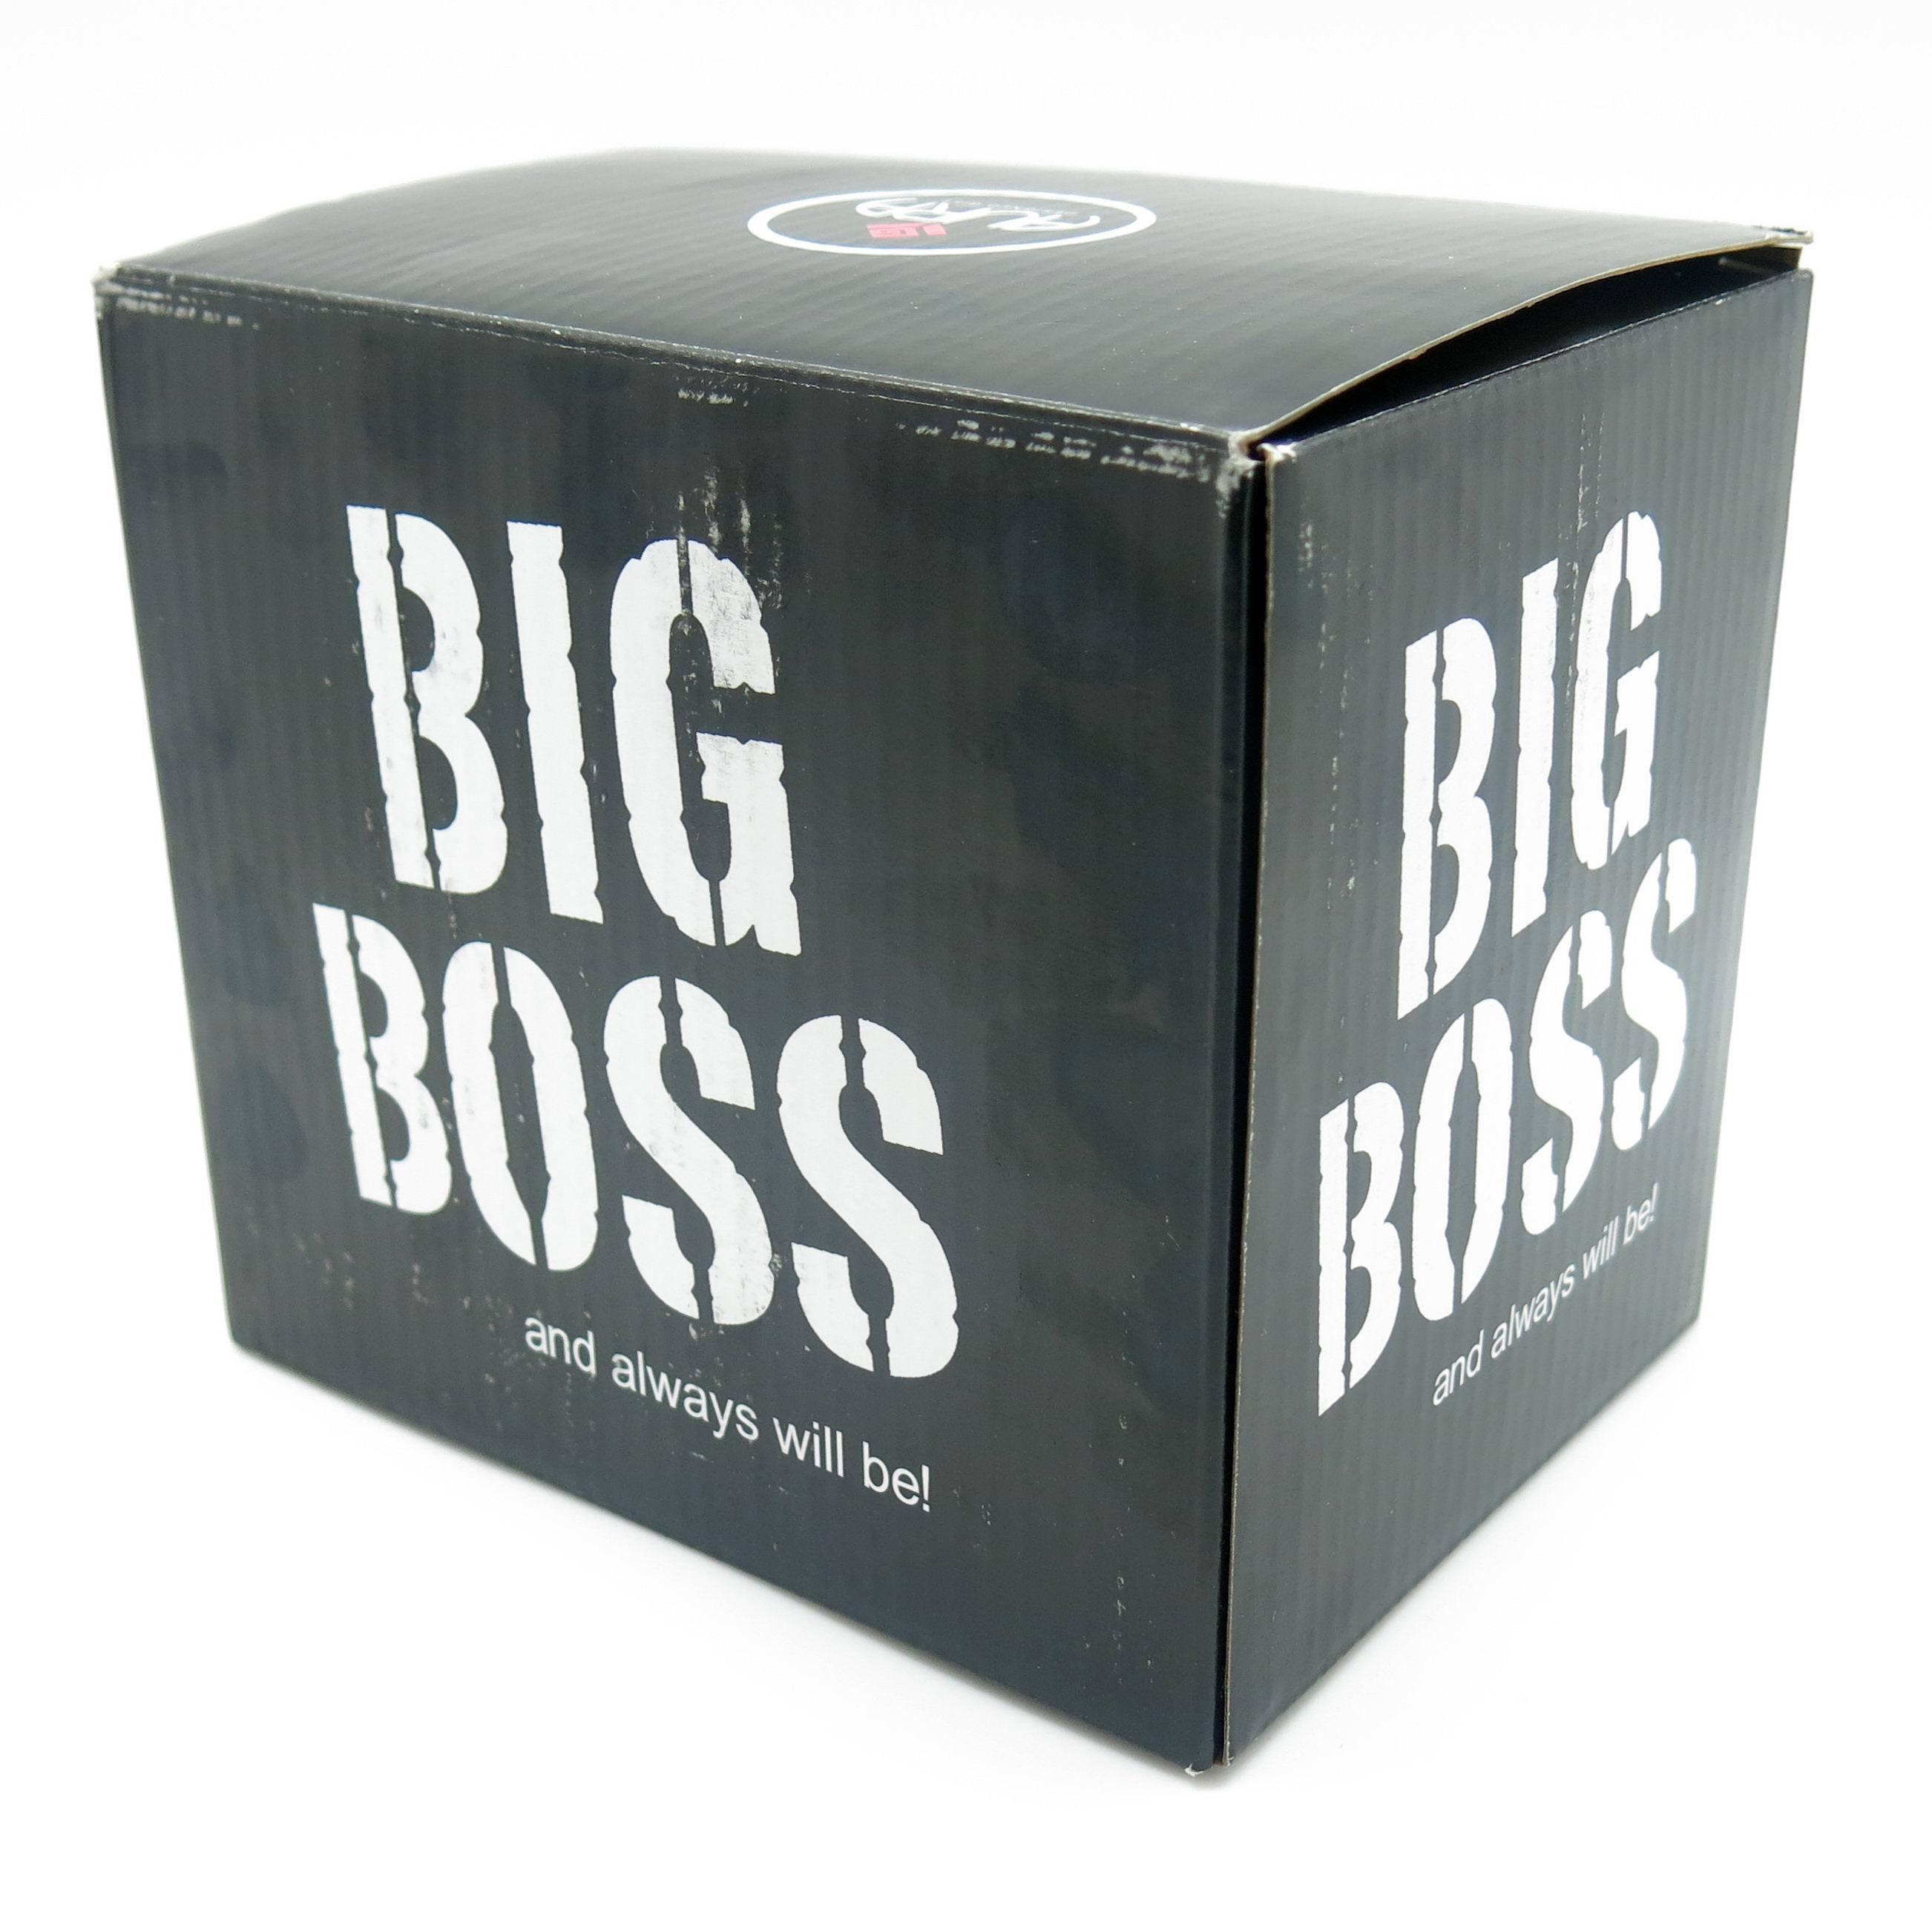 kruzhka-big-boss-2